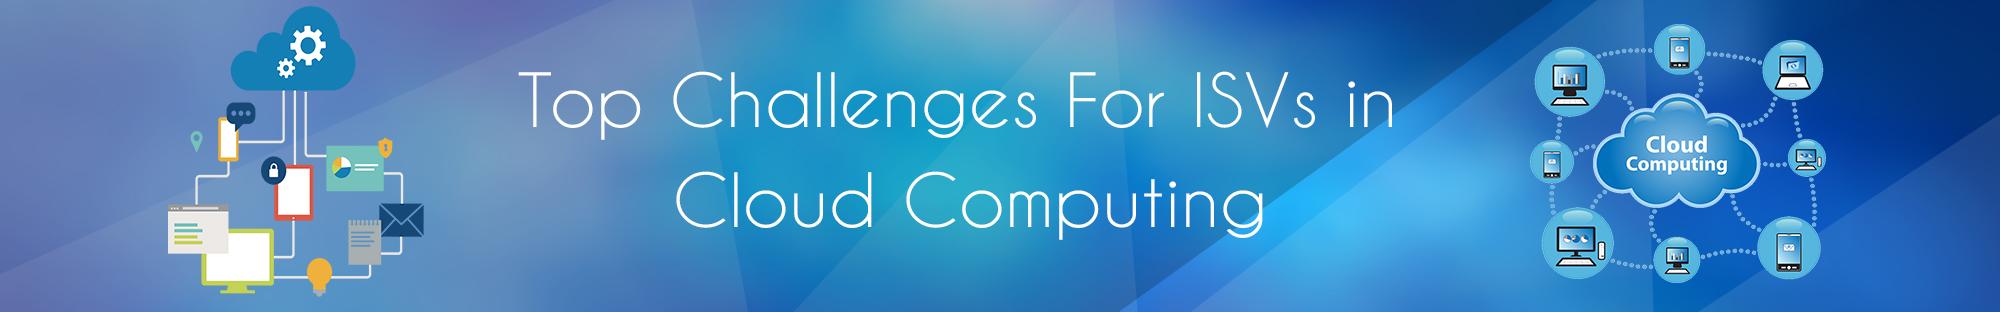 Top Challenges For ISVs in Cloud Computing_Blog